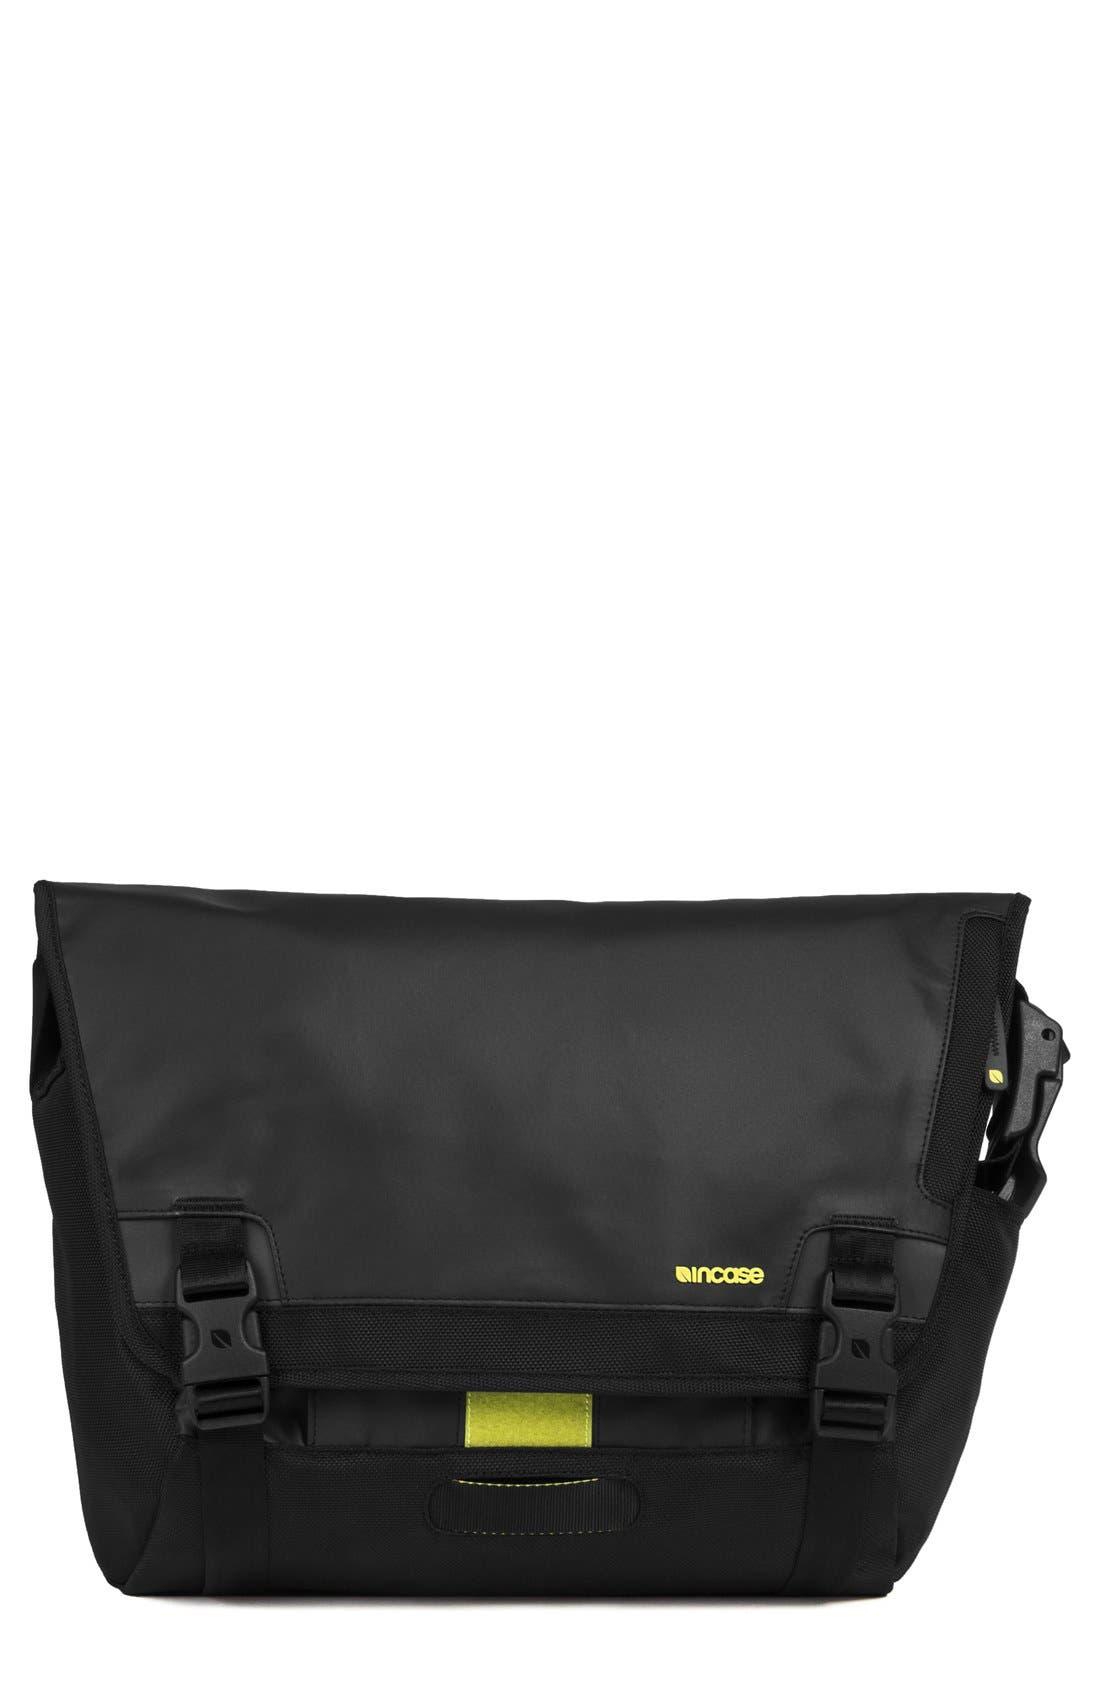 Incase Designs 'Range' Messenger Bag